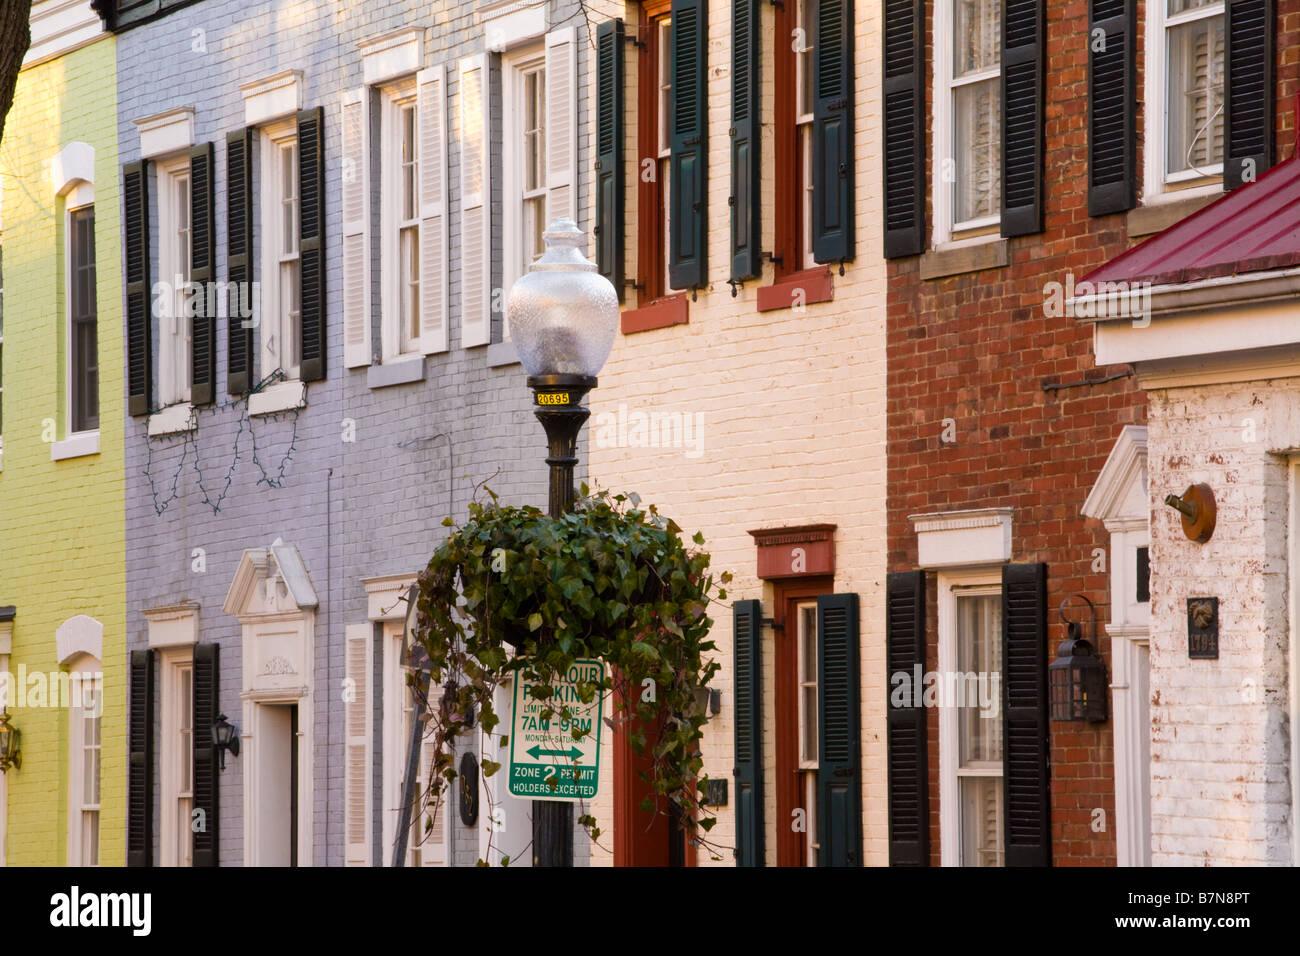 Architettura residenziale di Georgetown a Washington D.C. Immagini Stock